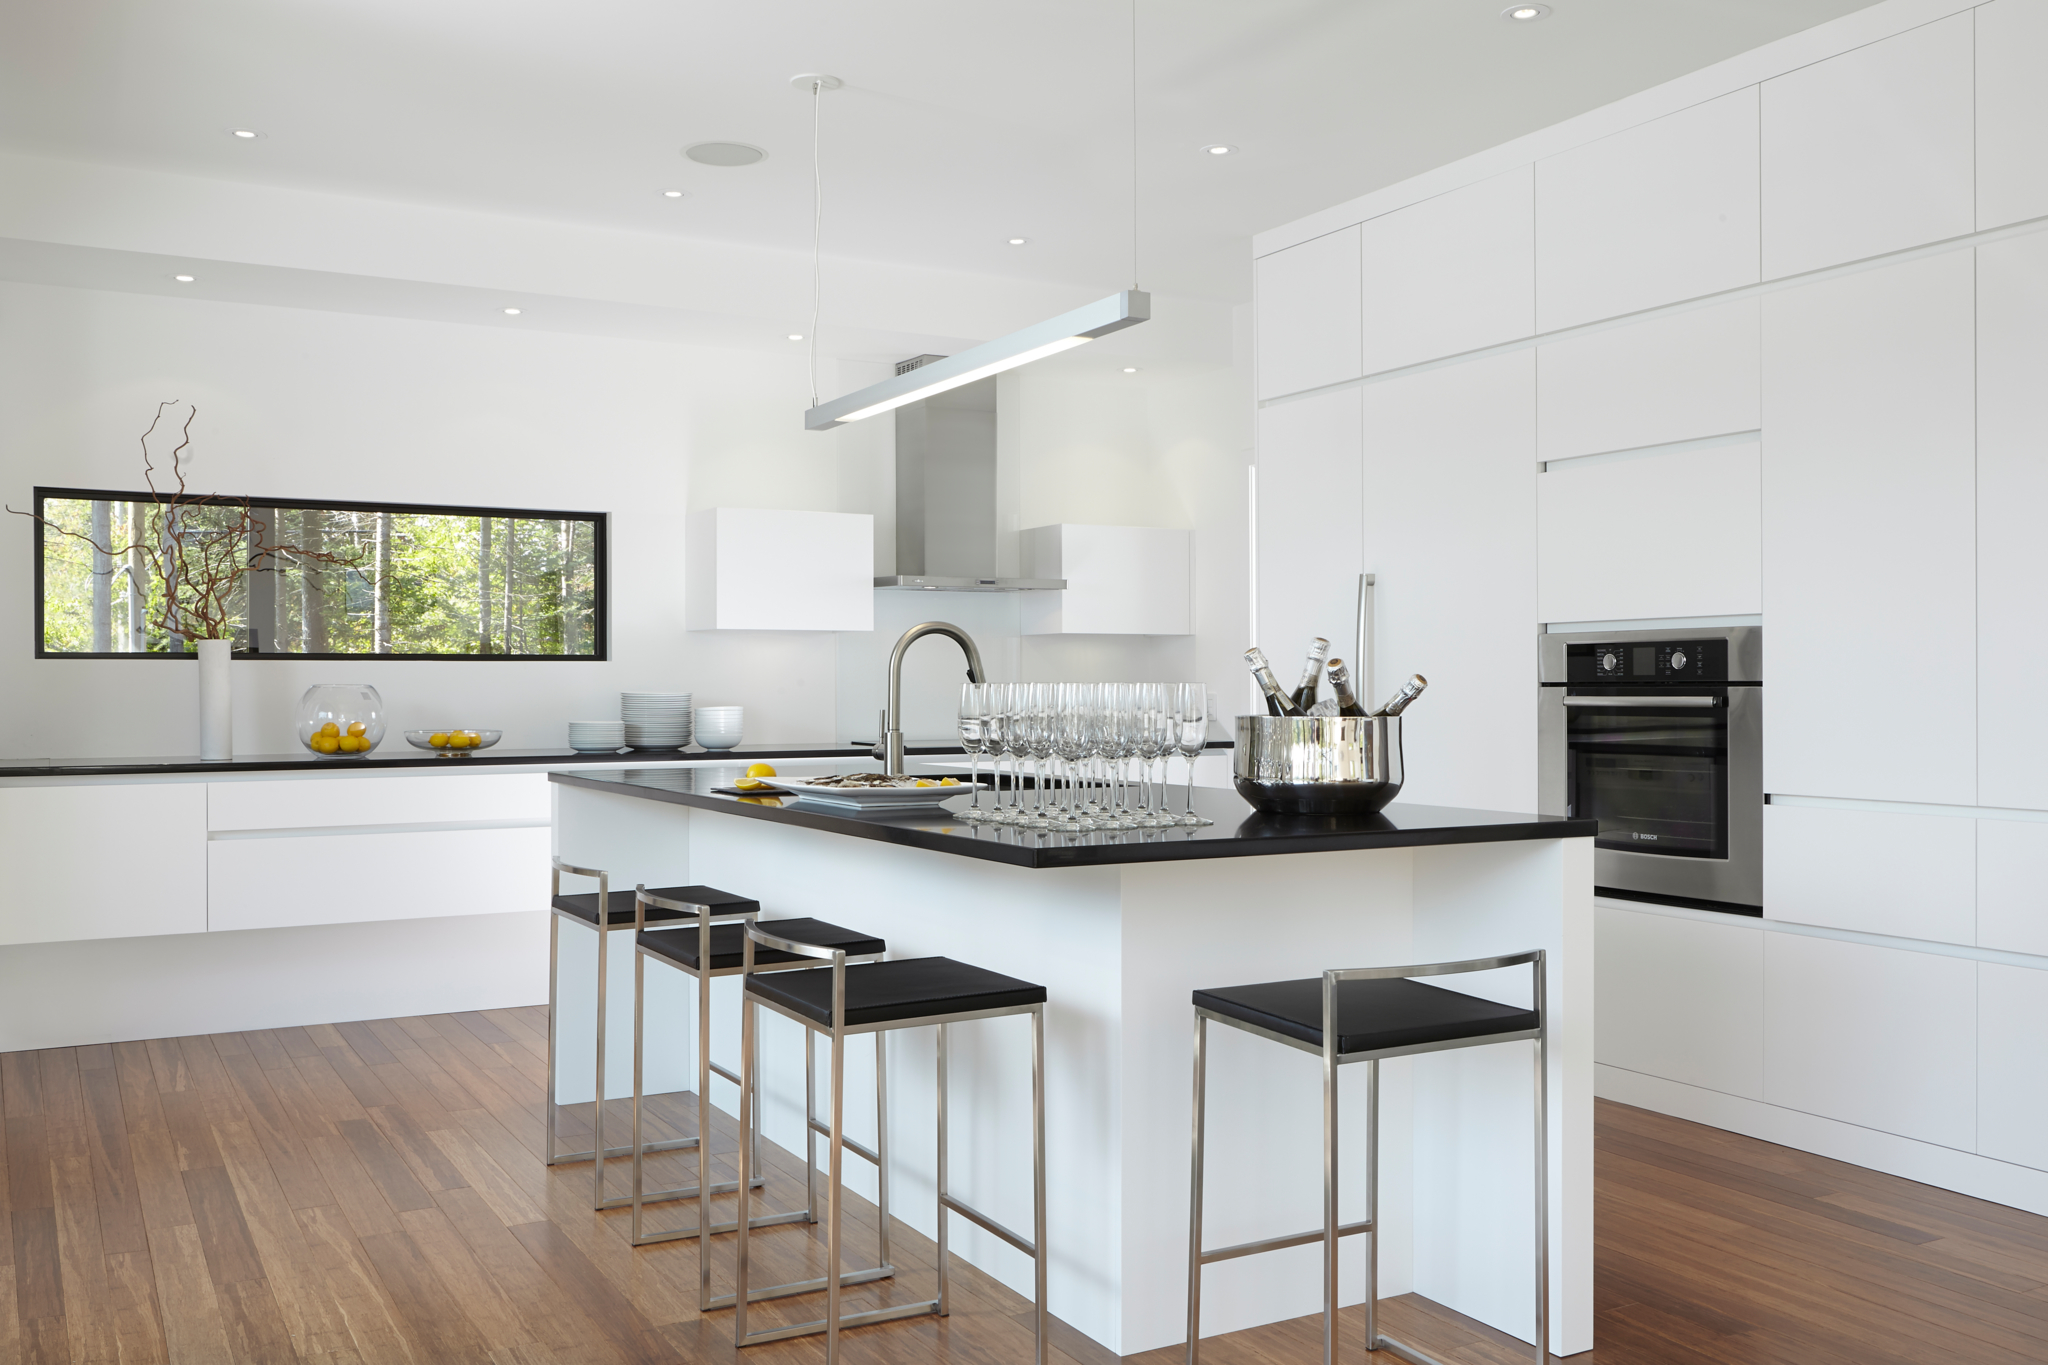 cuisines gonthier inc l vis qc ourbis. Black Bedroom Furniture Sets. Home Design Ideas